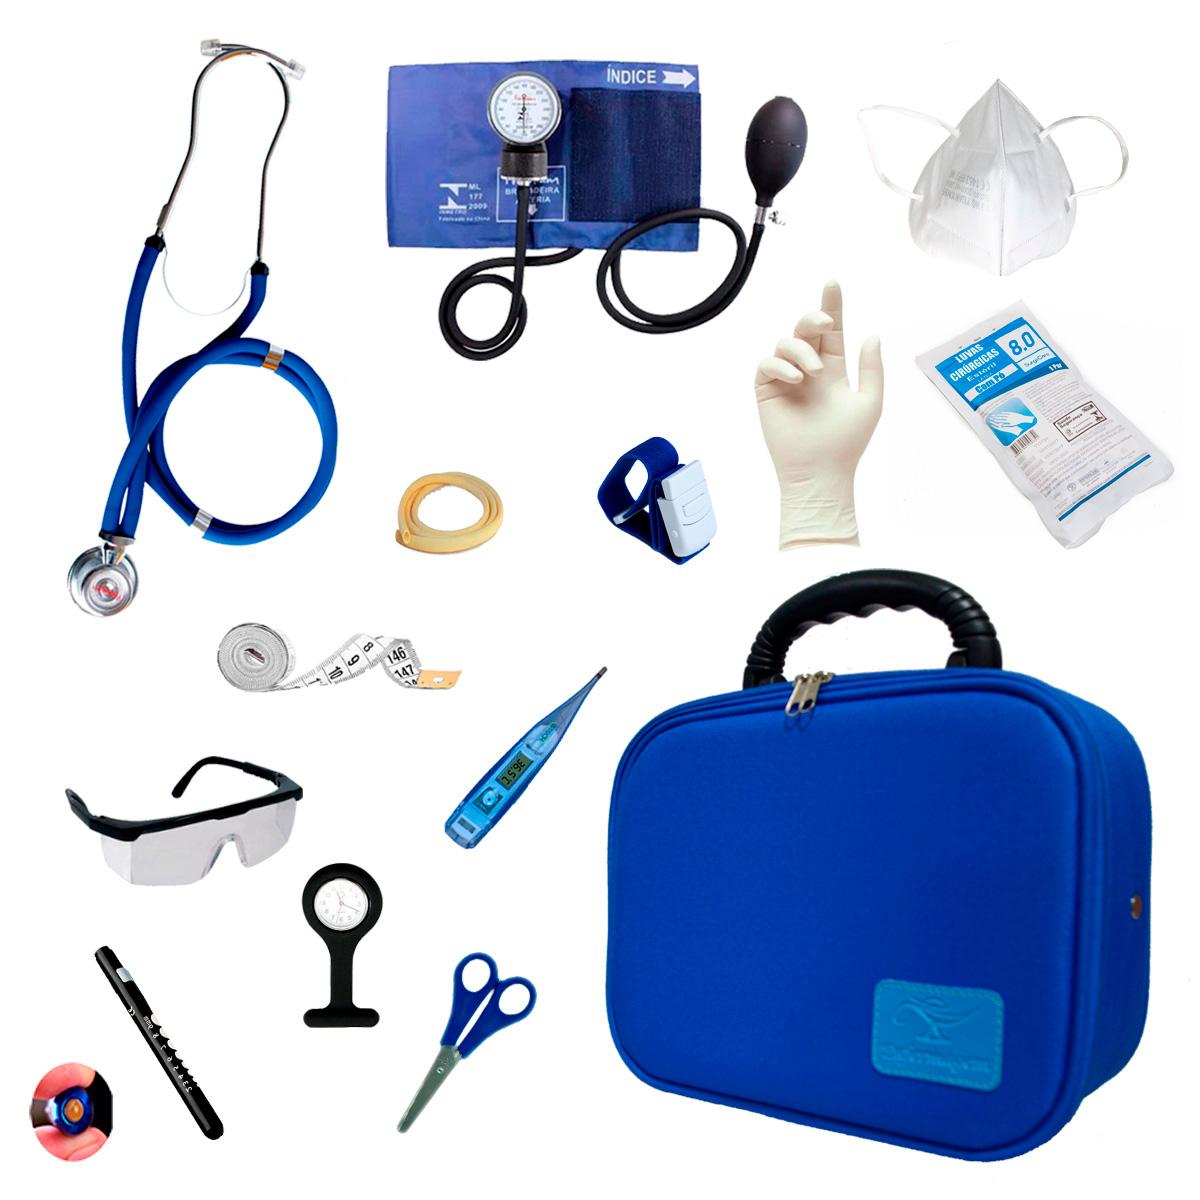 Kit Enfermagem Com Maleta Acadêmica Luxo Completo (MOD03)